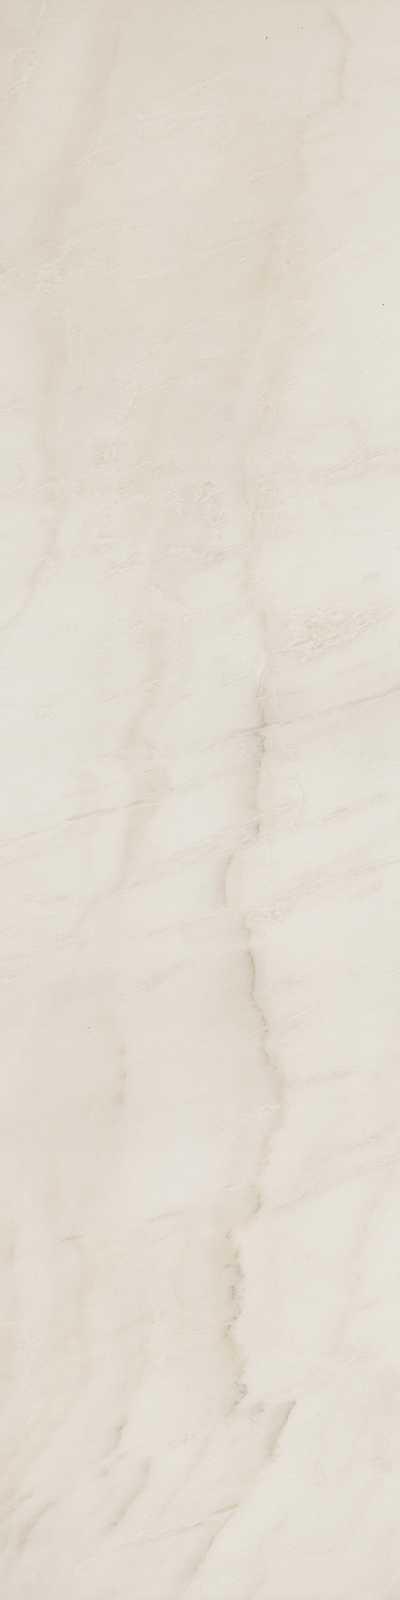 Gresie portelanata Marazzi Allmarble Raffaello 30X120 Rectificata MMJN